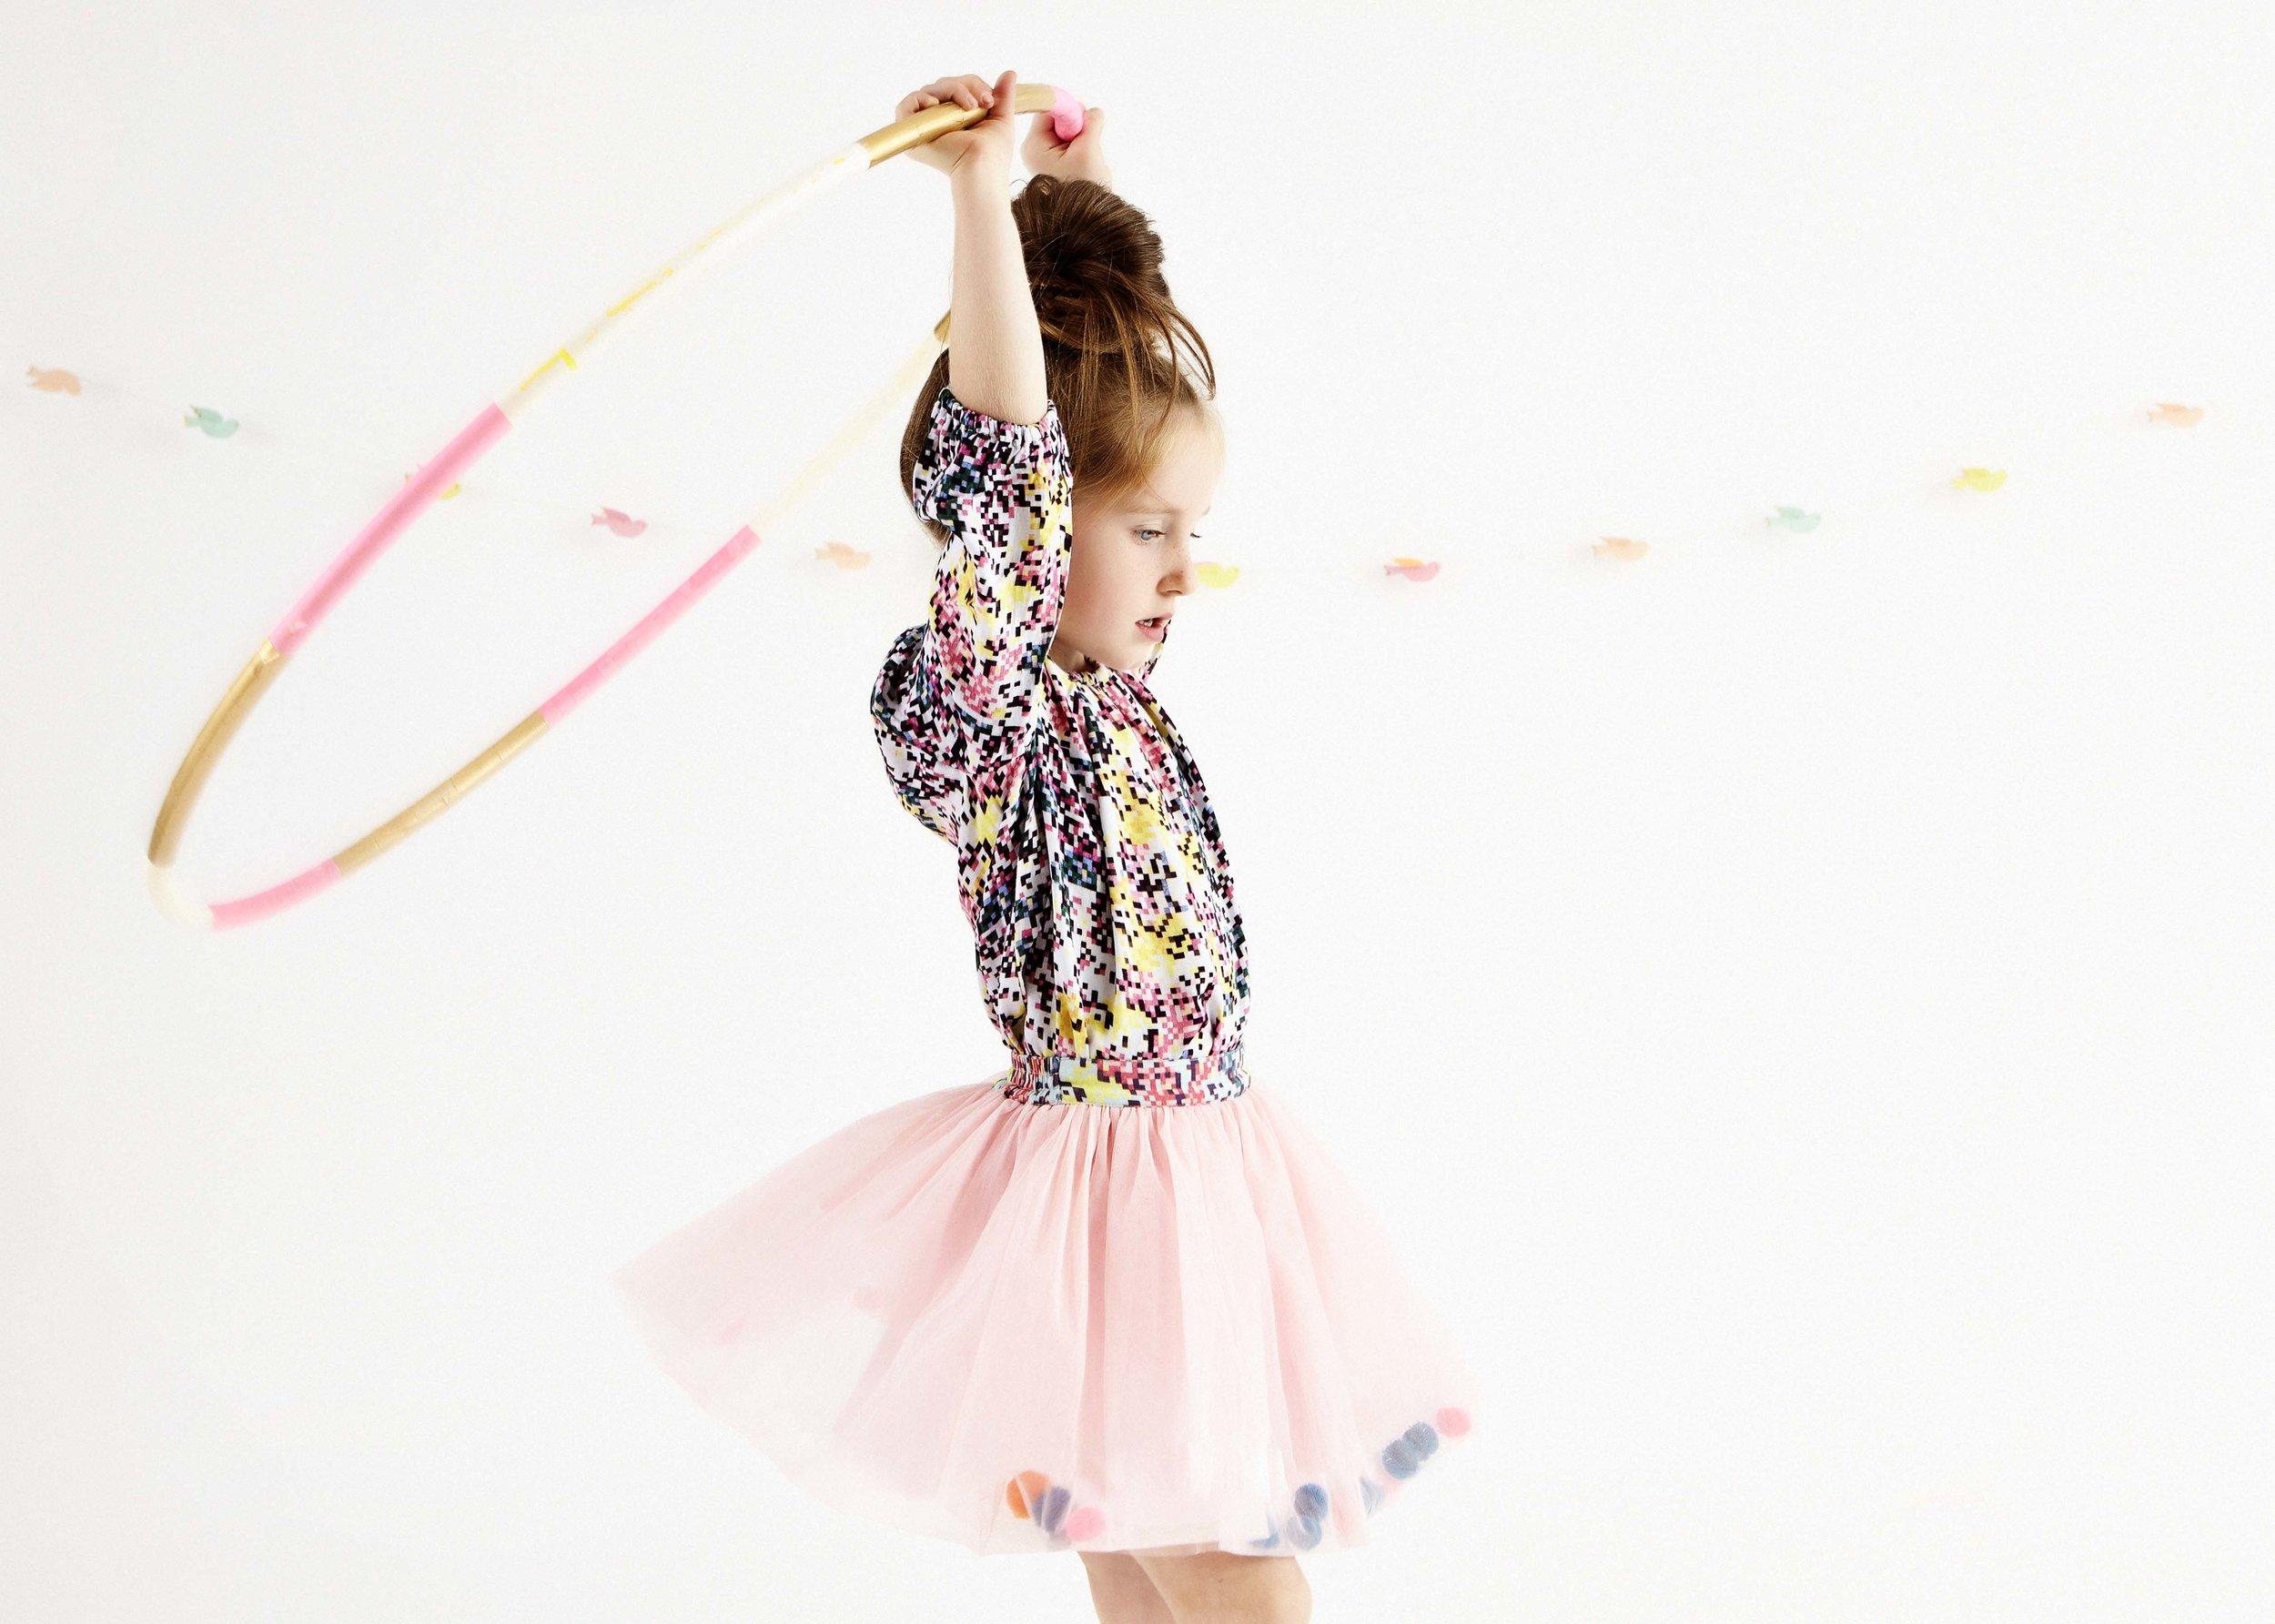 Liz_Cooper_Interior_Stylist_Styling_Kids_fashion_hula hoop.jpg